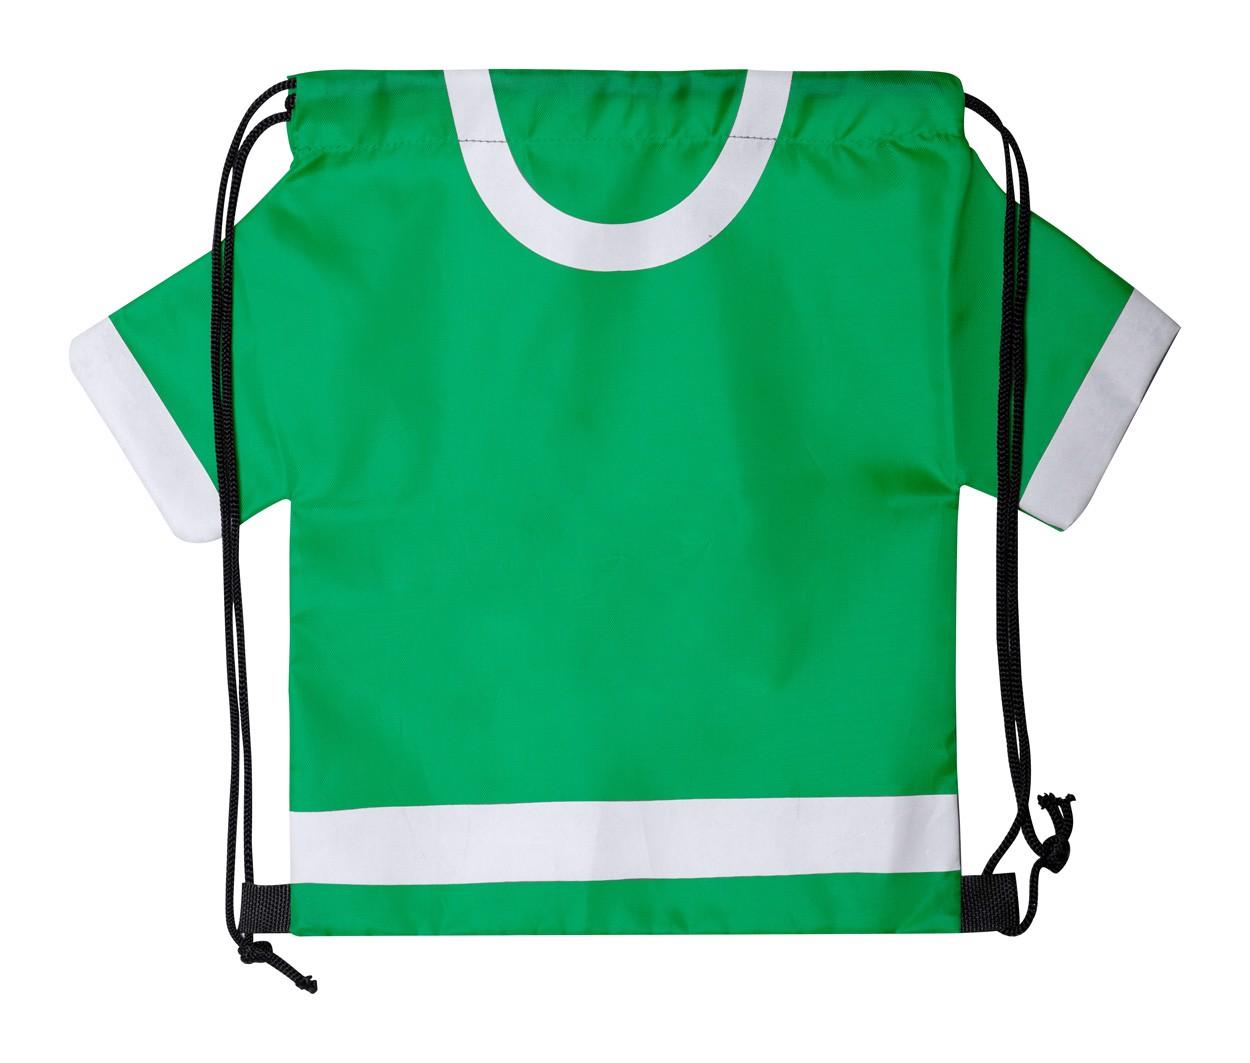 Drawstring Bag Paxer - Green / White